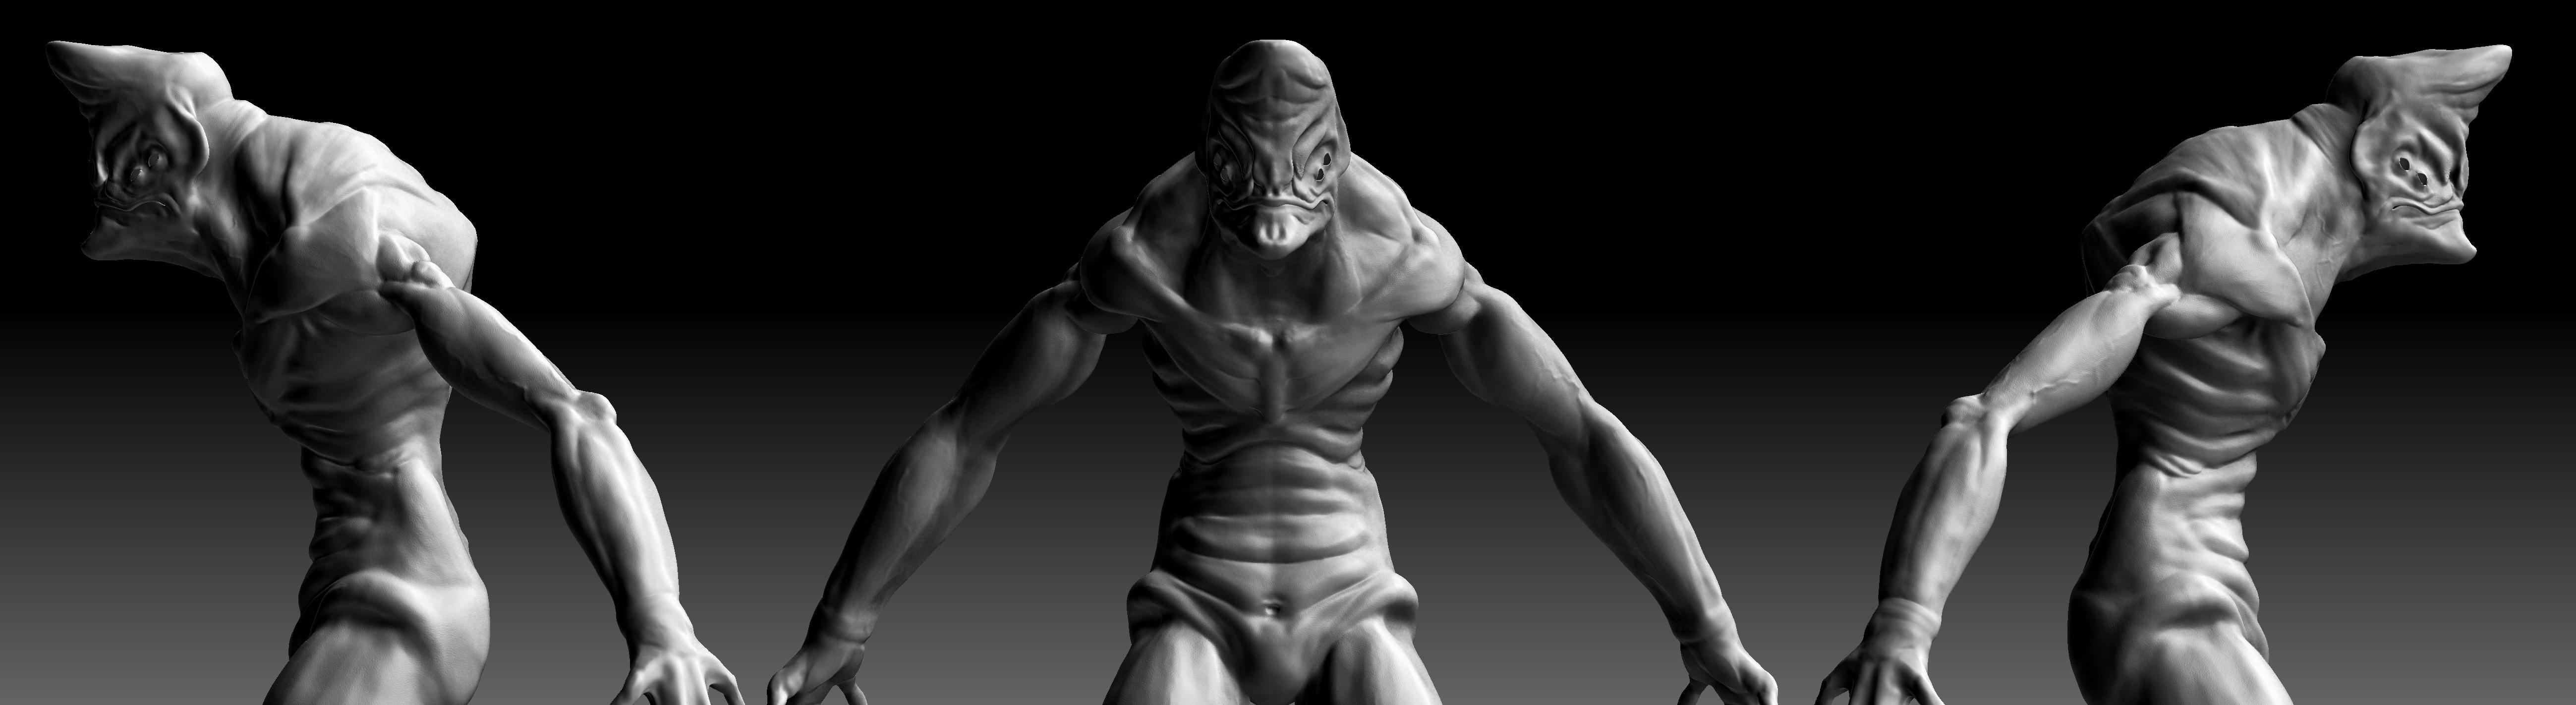 alien_sculpt_by_lorenzomelizza-d79aqhh.jpg